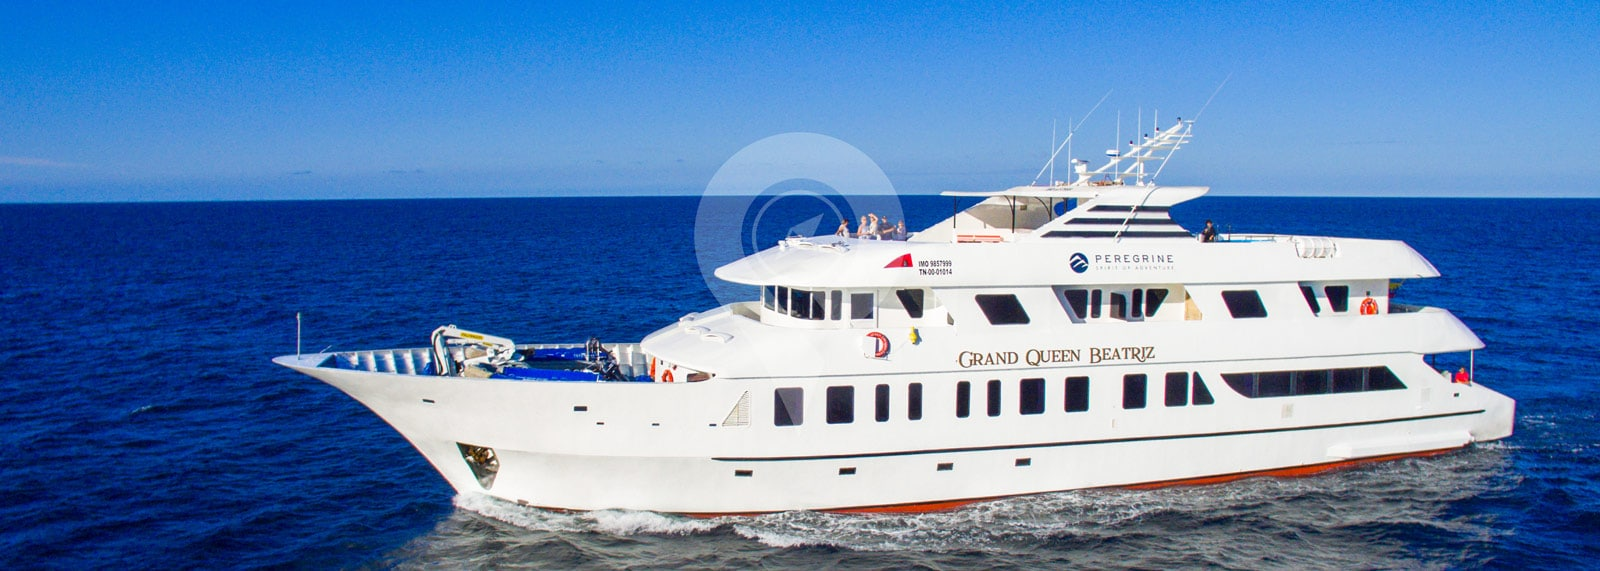 Grand Queen Beatriz Galapagos Yacht